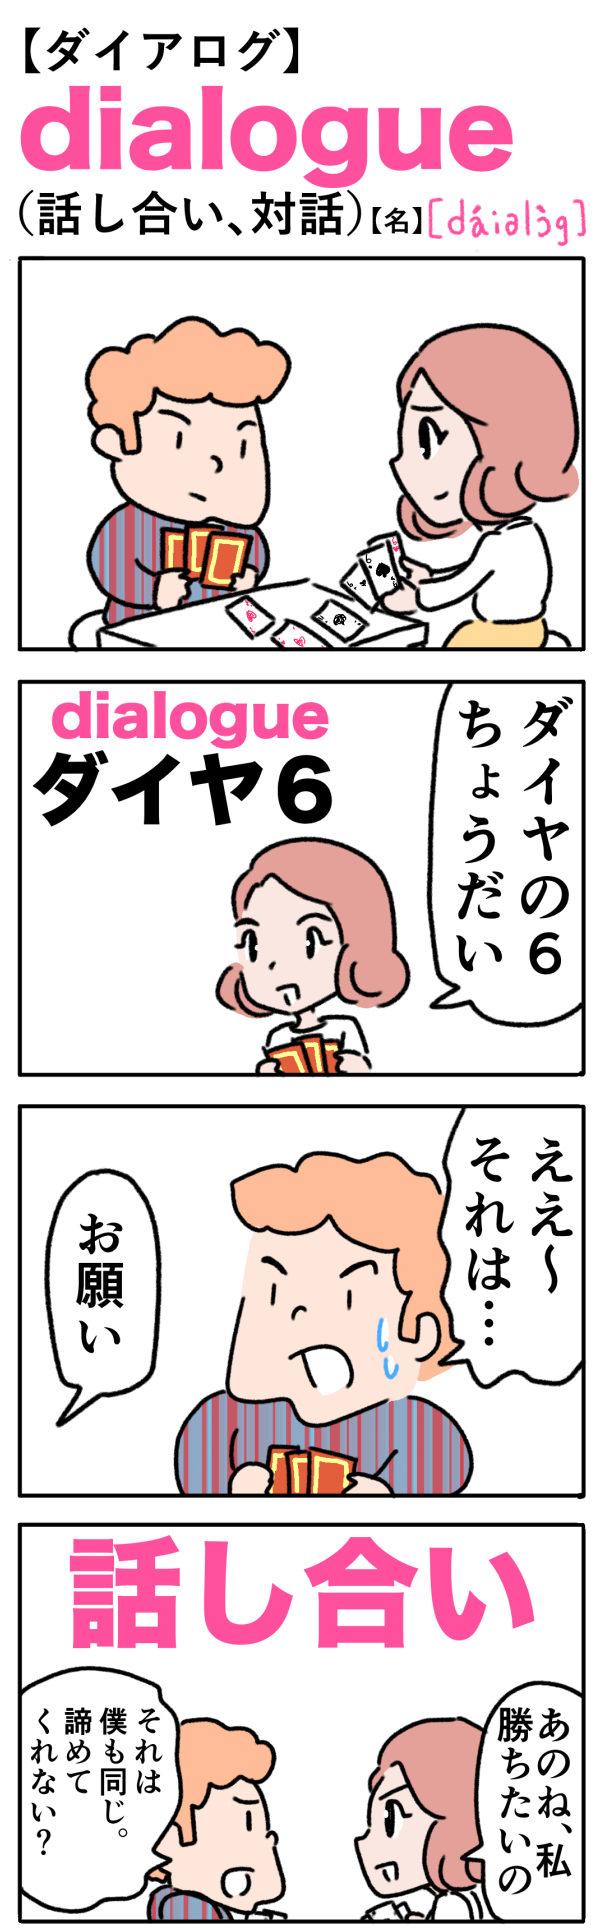 dialogue(話し合い、対話)の語呂合わせ英単語